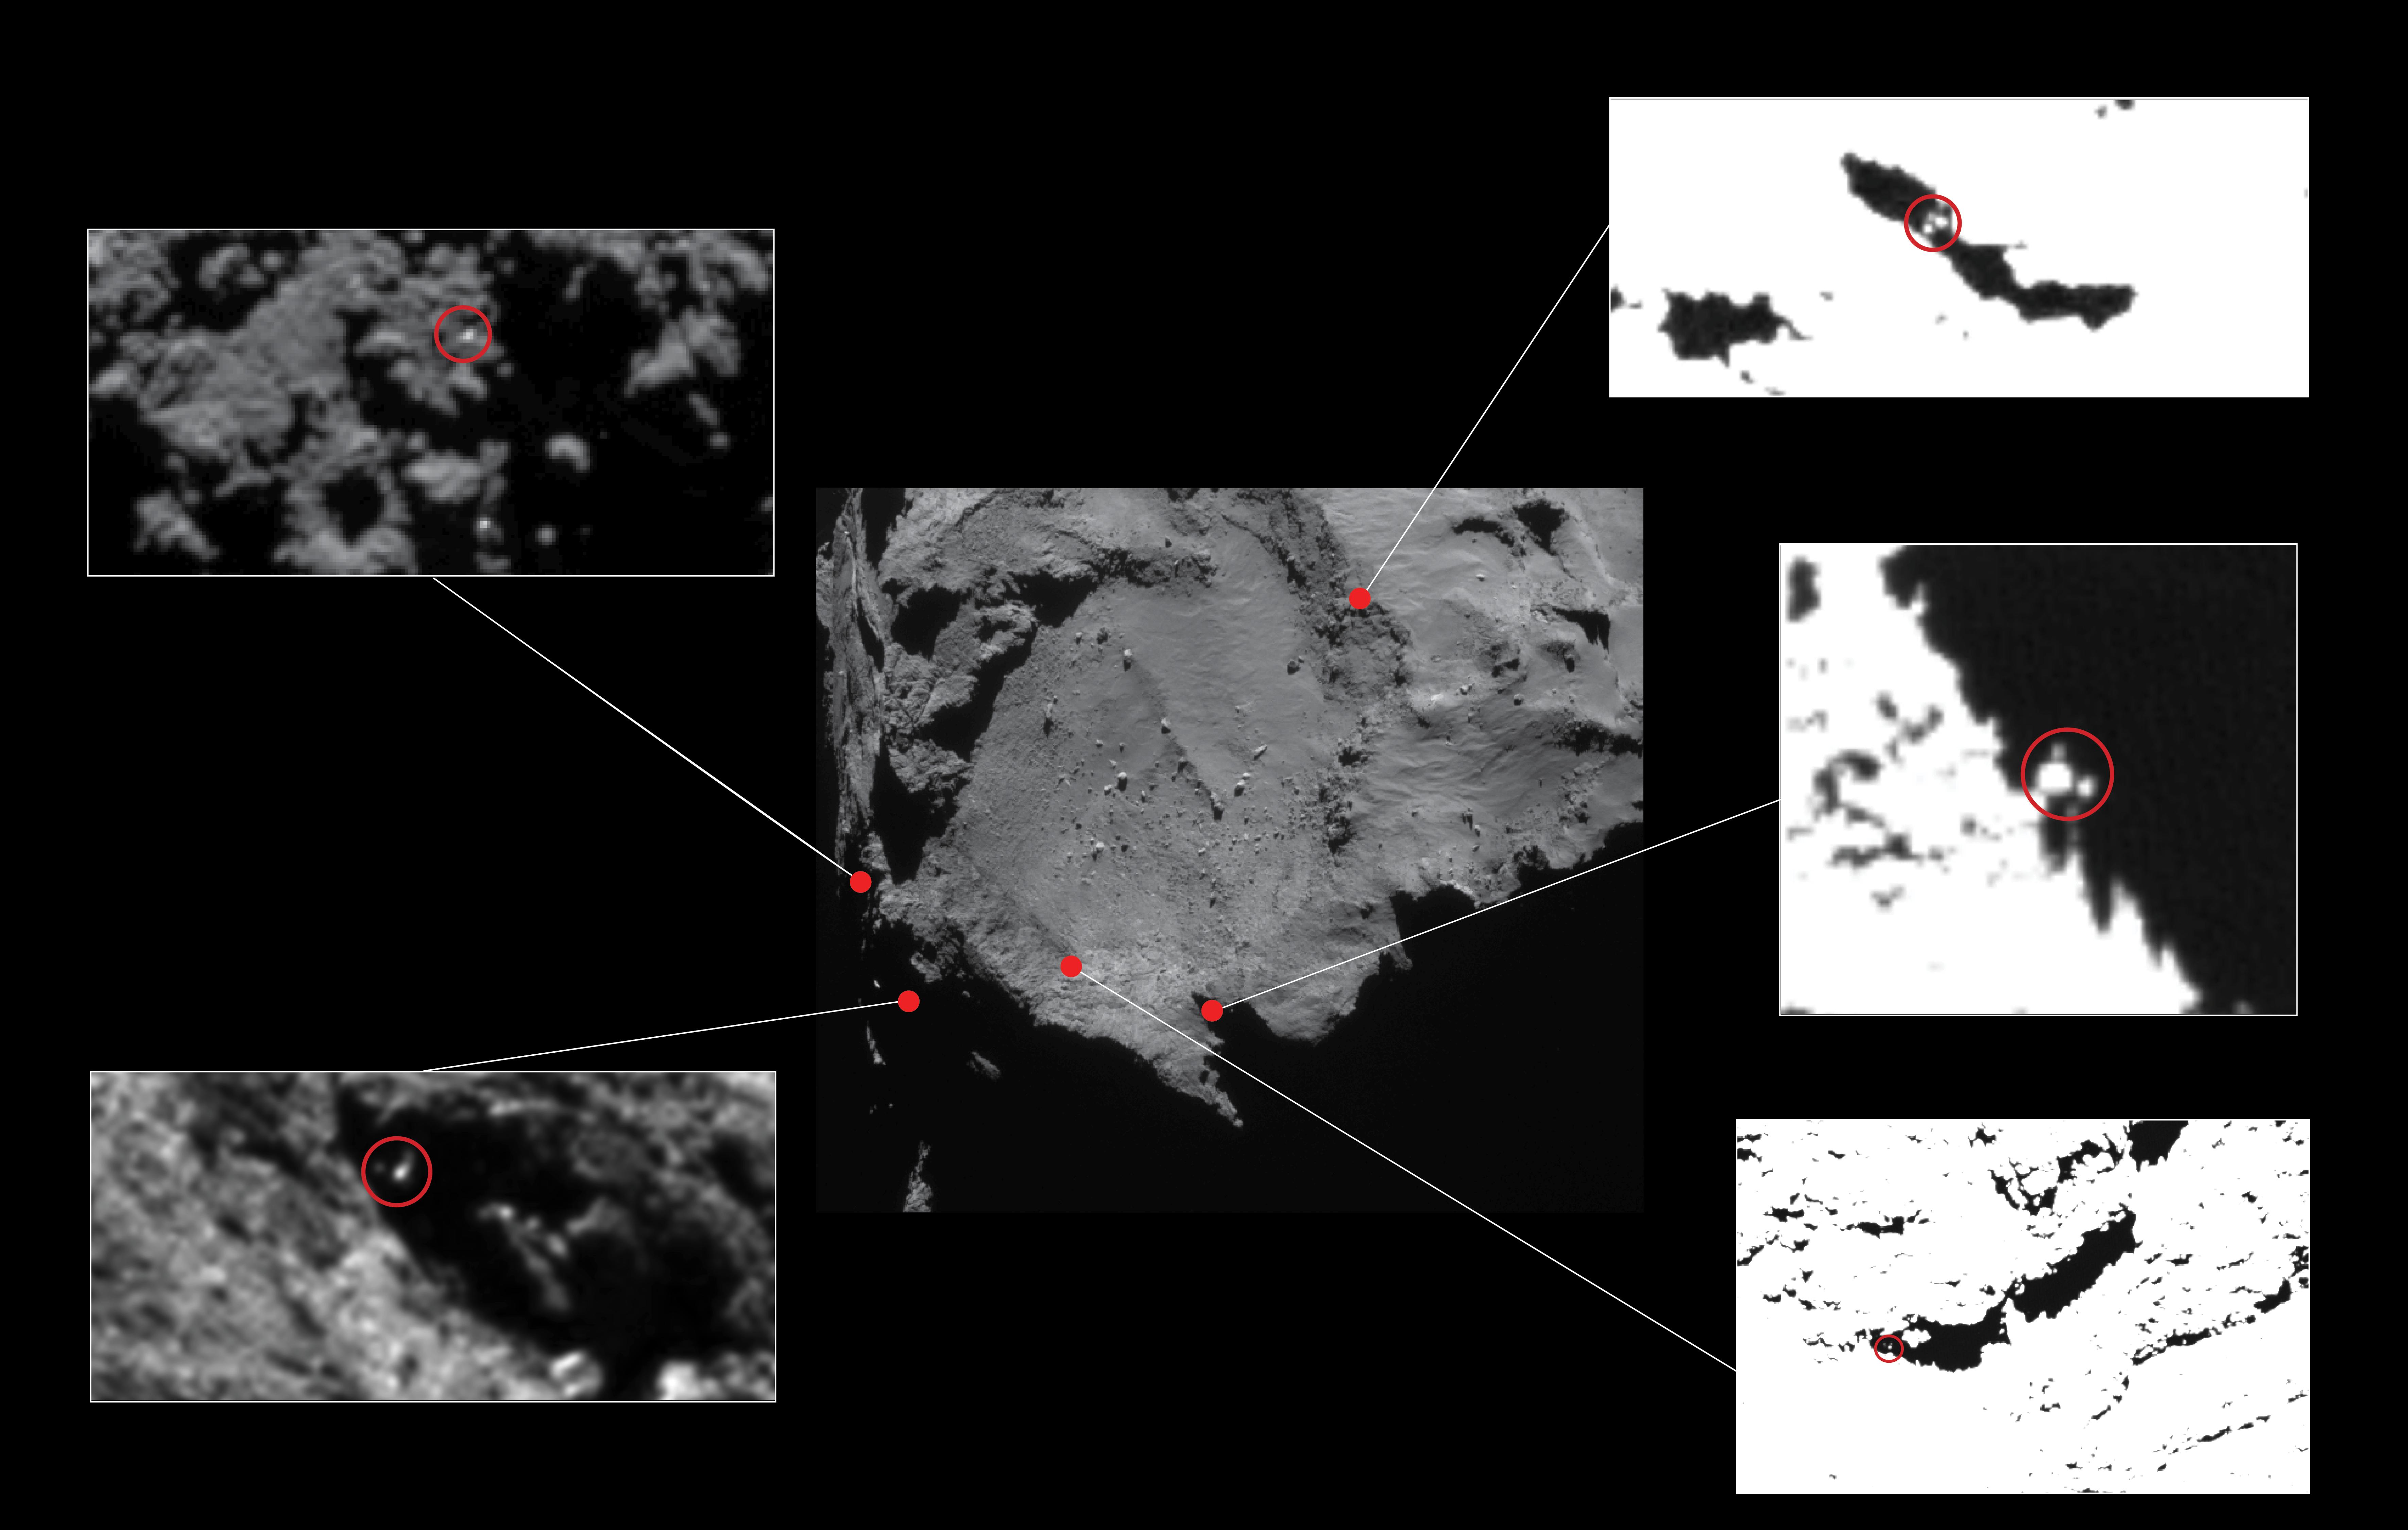 Posibles zonas de aterrizaje de Philae (ESA/Rosetta/MPS for OSIRIS Team MPS/UPD/LAM/IAA/SSO/INTA/UPM/DASP/IDA).